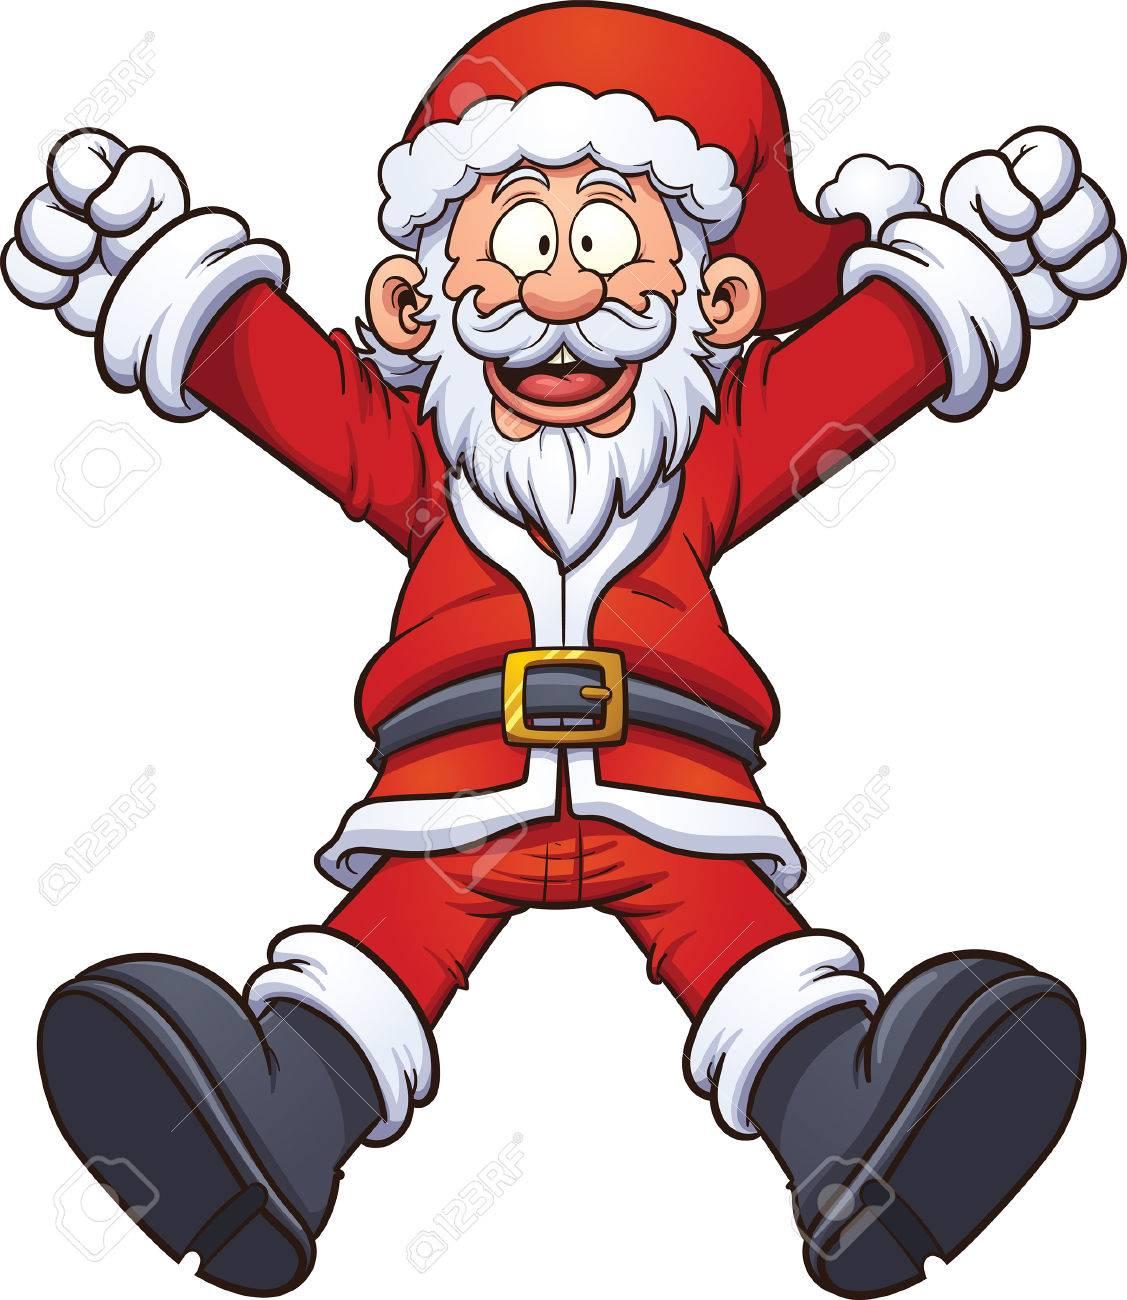 santa claus cartoon stock photos royalty free santa claus cartoon